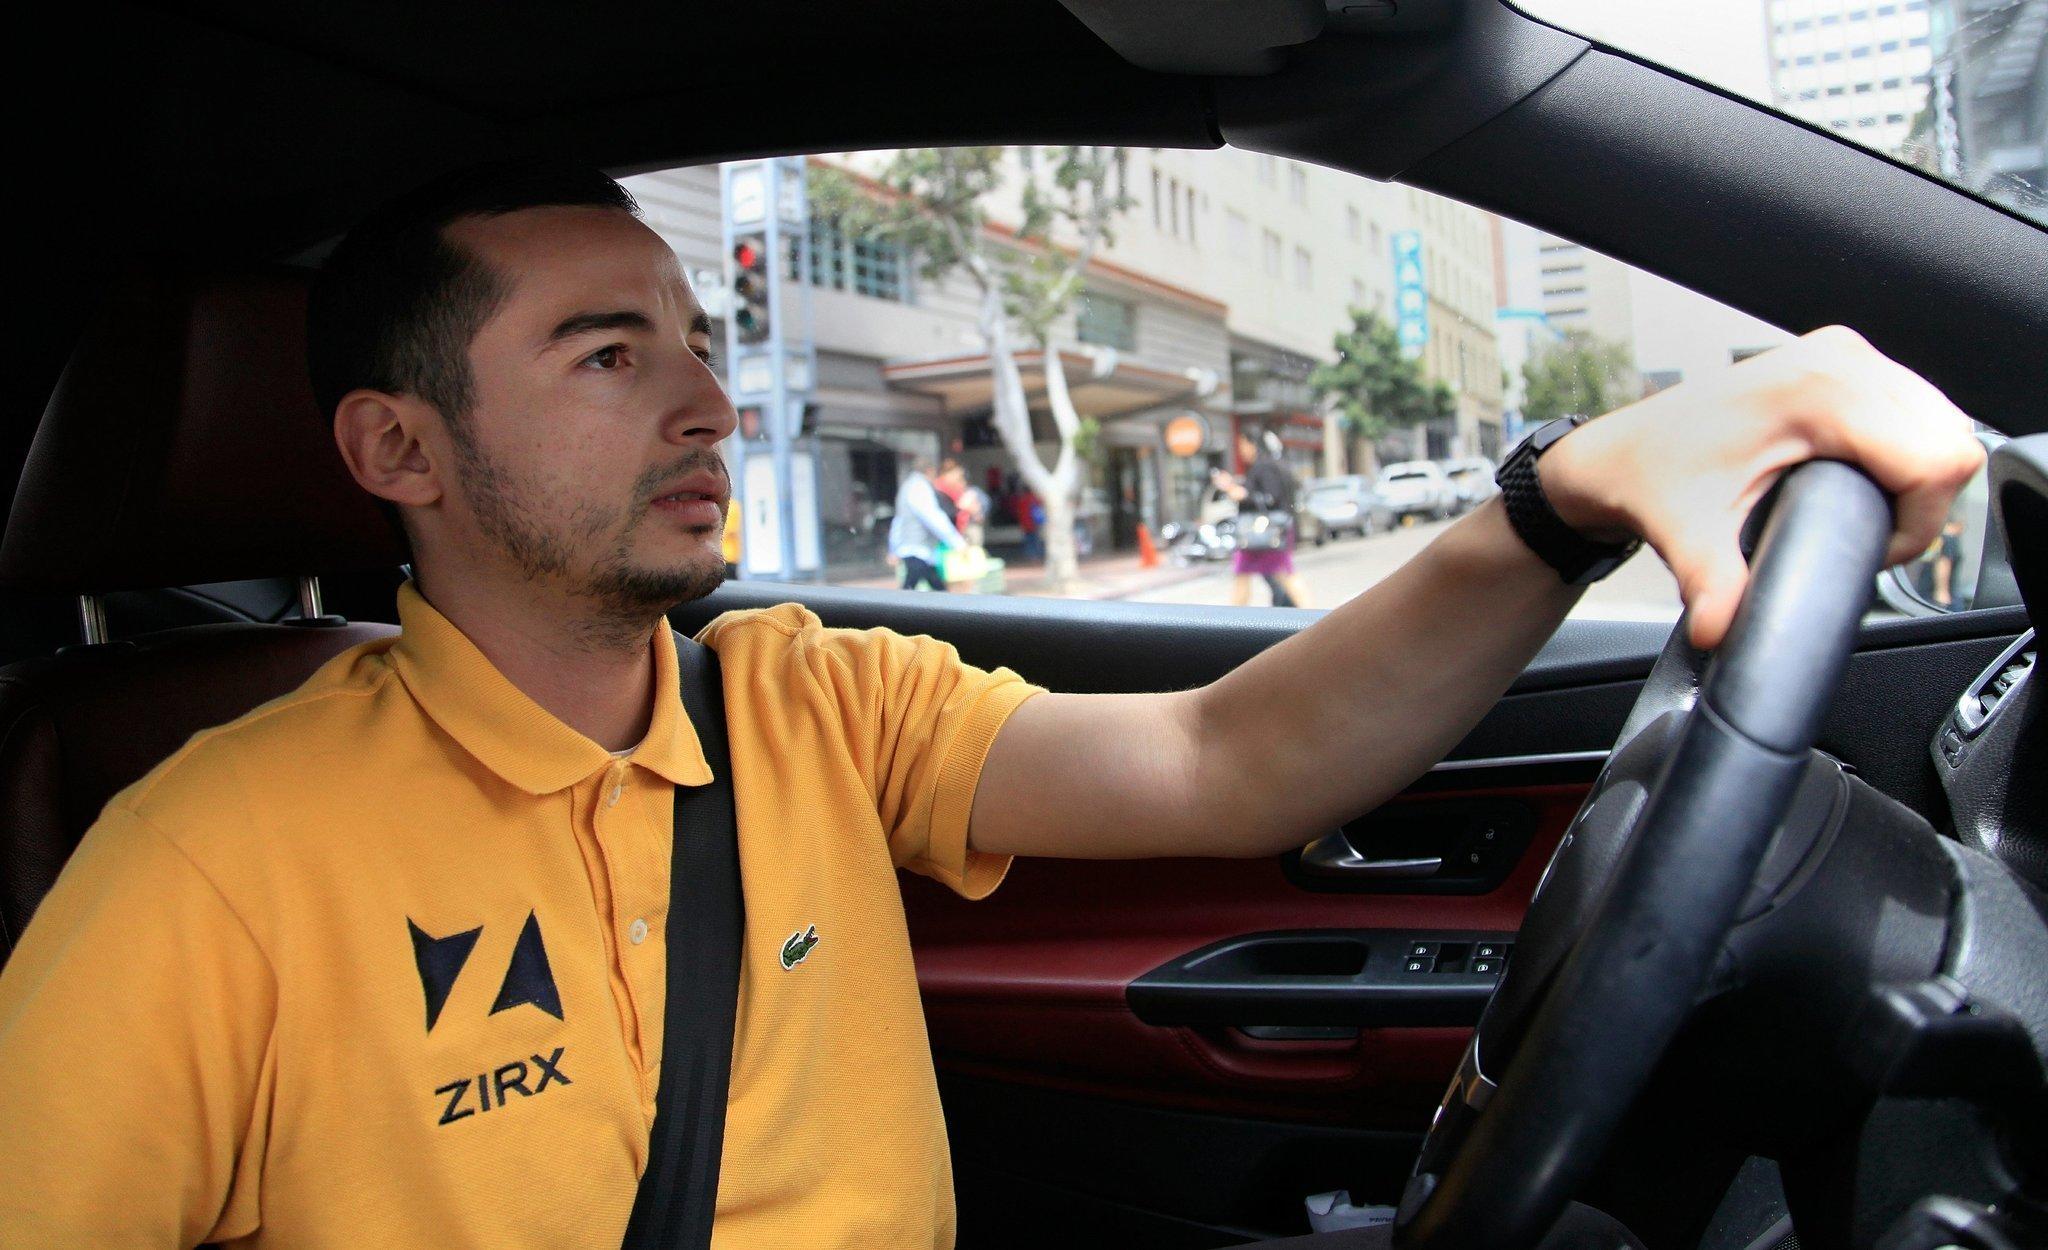 zirx parking app is your personal valet the san diego union tribune